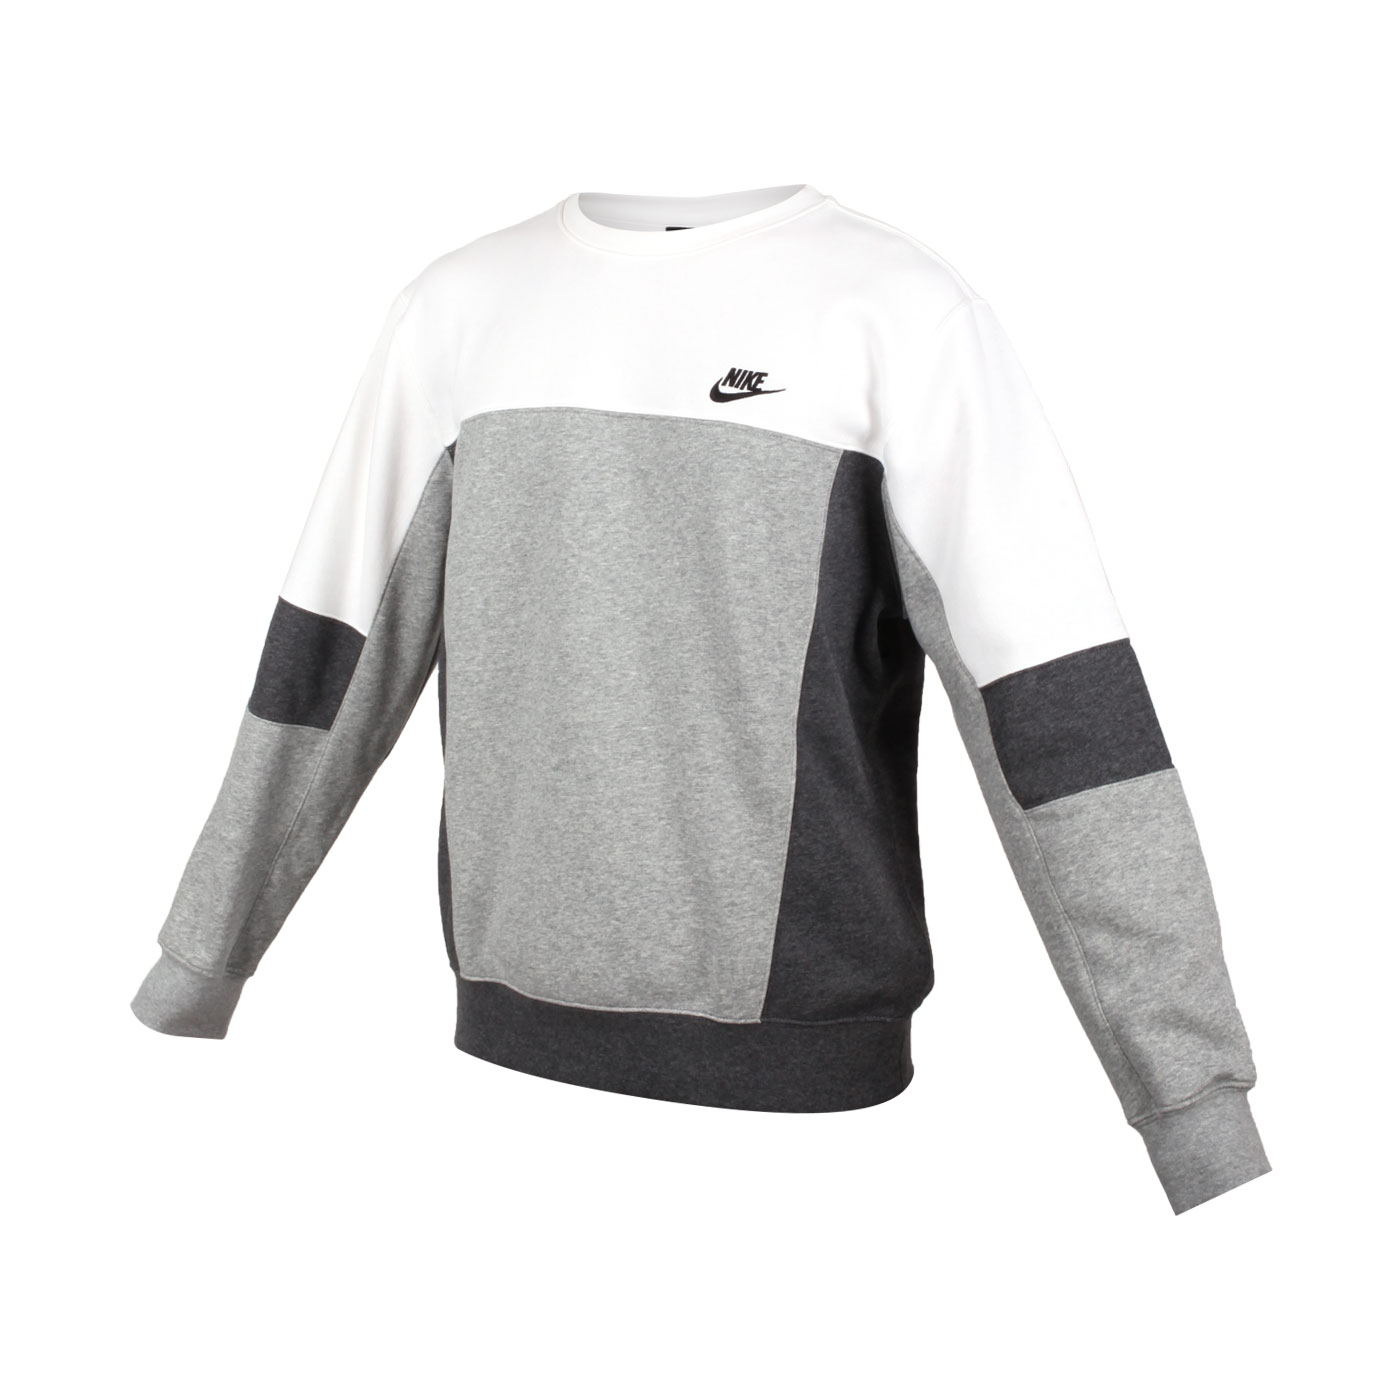 NIKE 男款長袖T恤 CZ9967-100